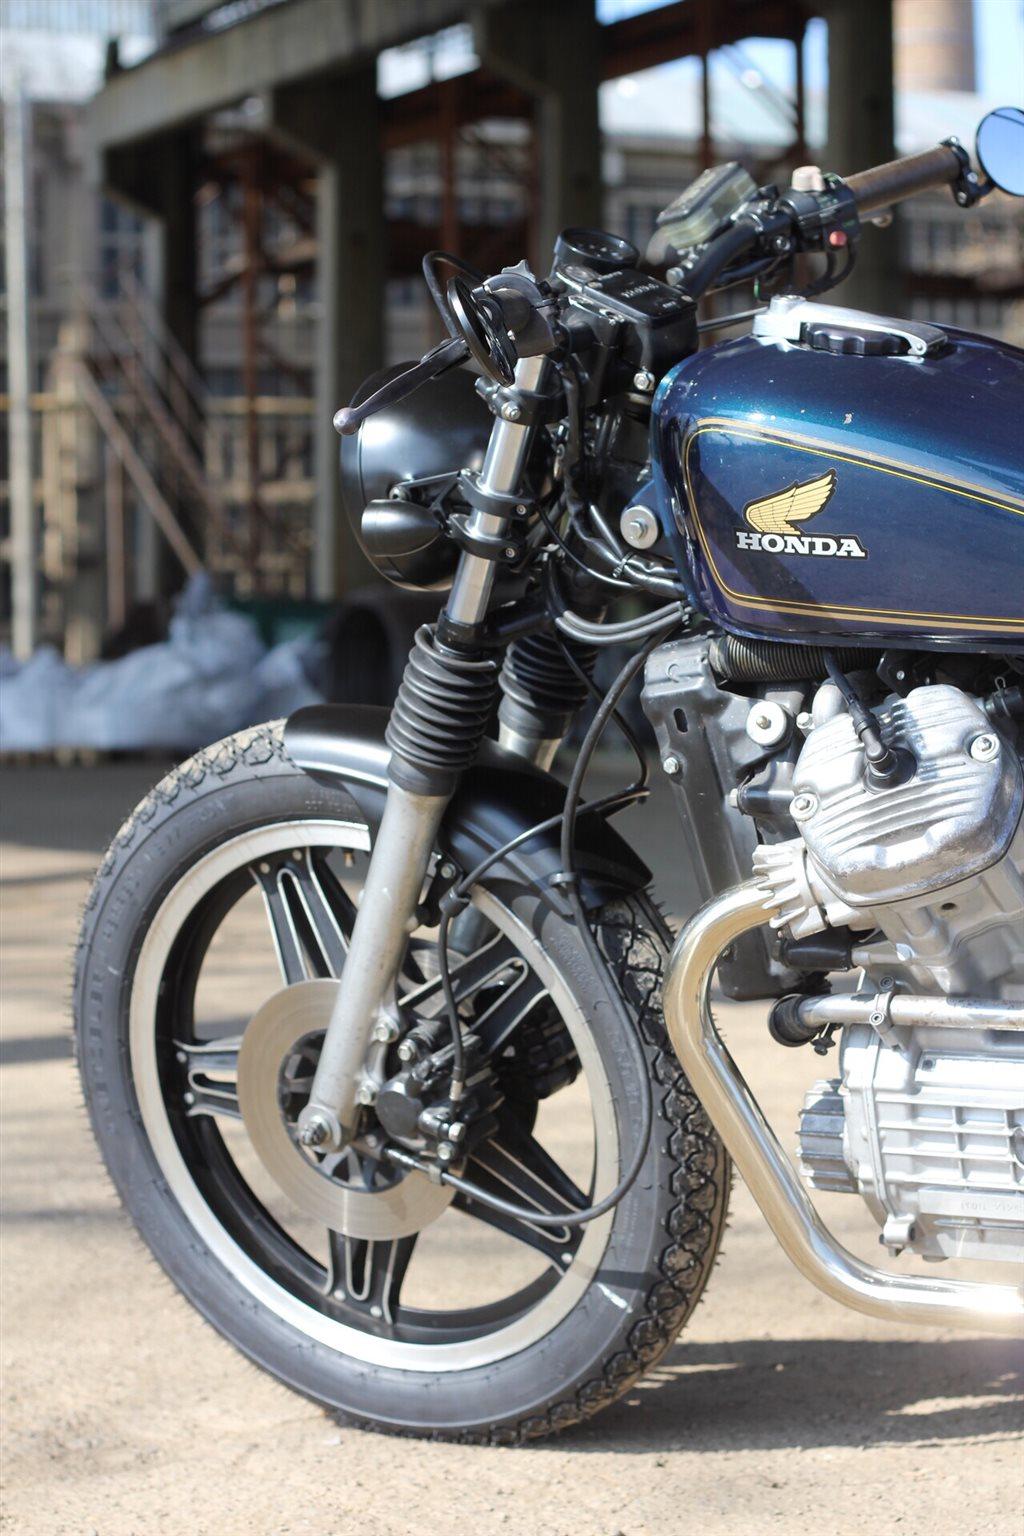 Umgebautes Motorrad Honda CX 500 von BPR-Bikes e.K